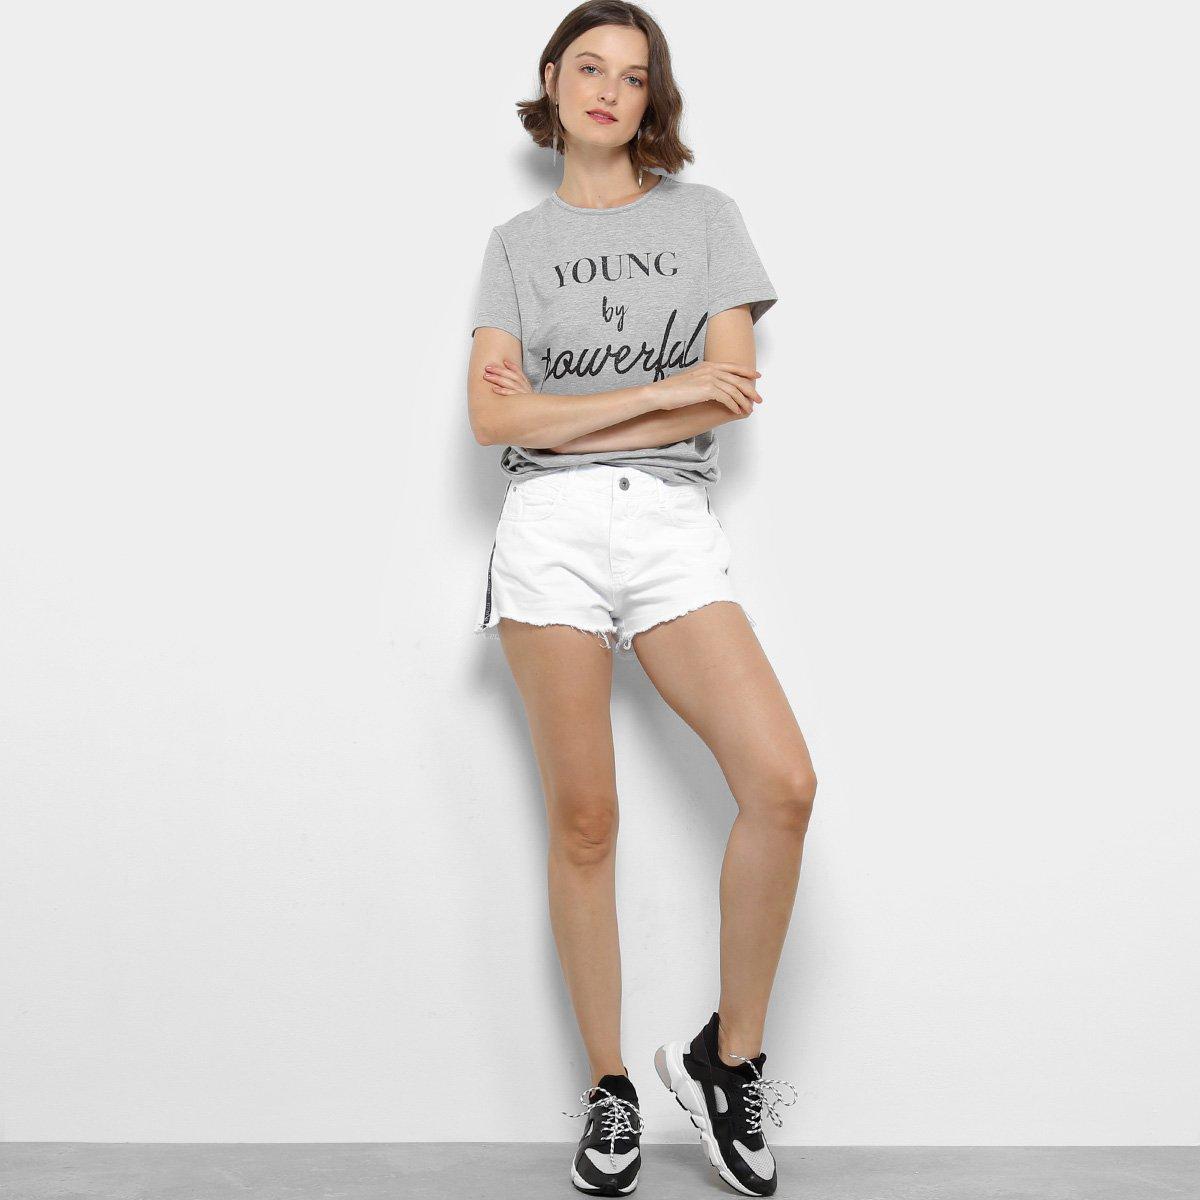 Camiseta Colcci Young By Powerful Feminina - Mescla - Compre Agora ... 82b52c6f8f3